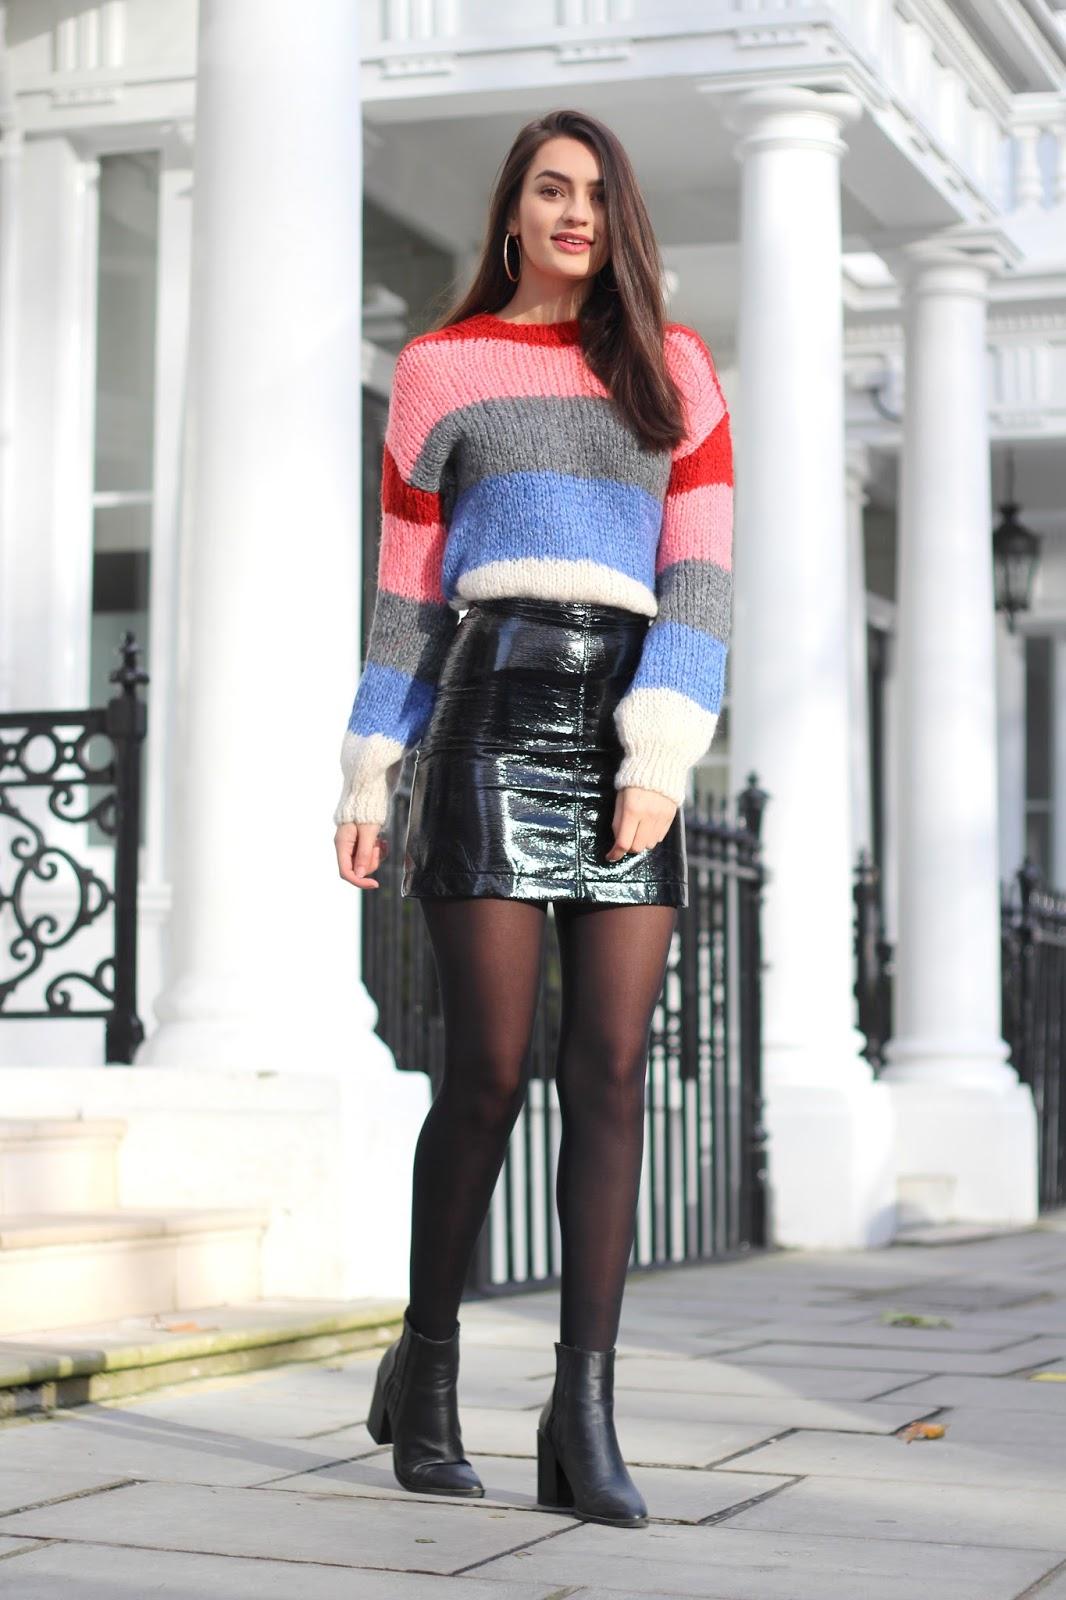 fashion blog london peexo personal style stripes vinyl